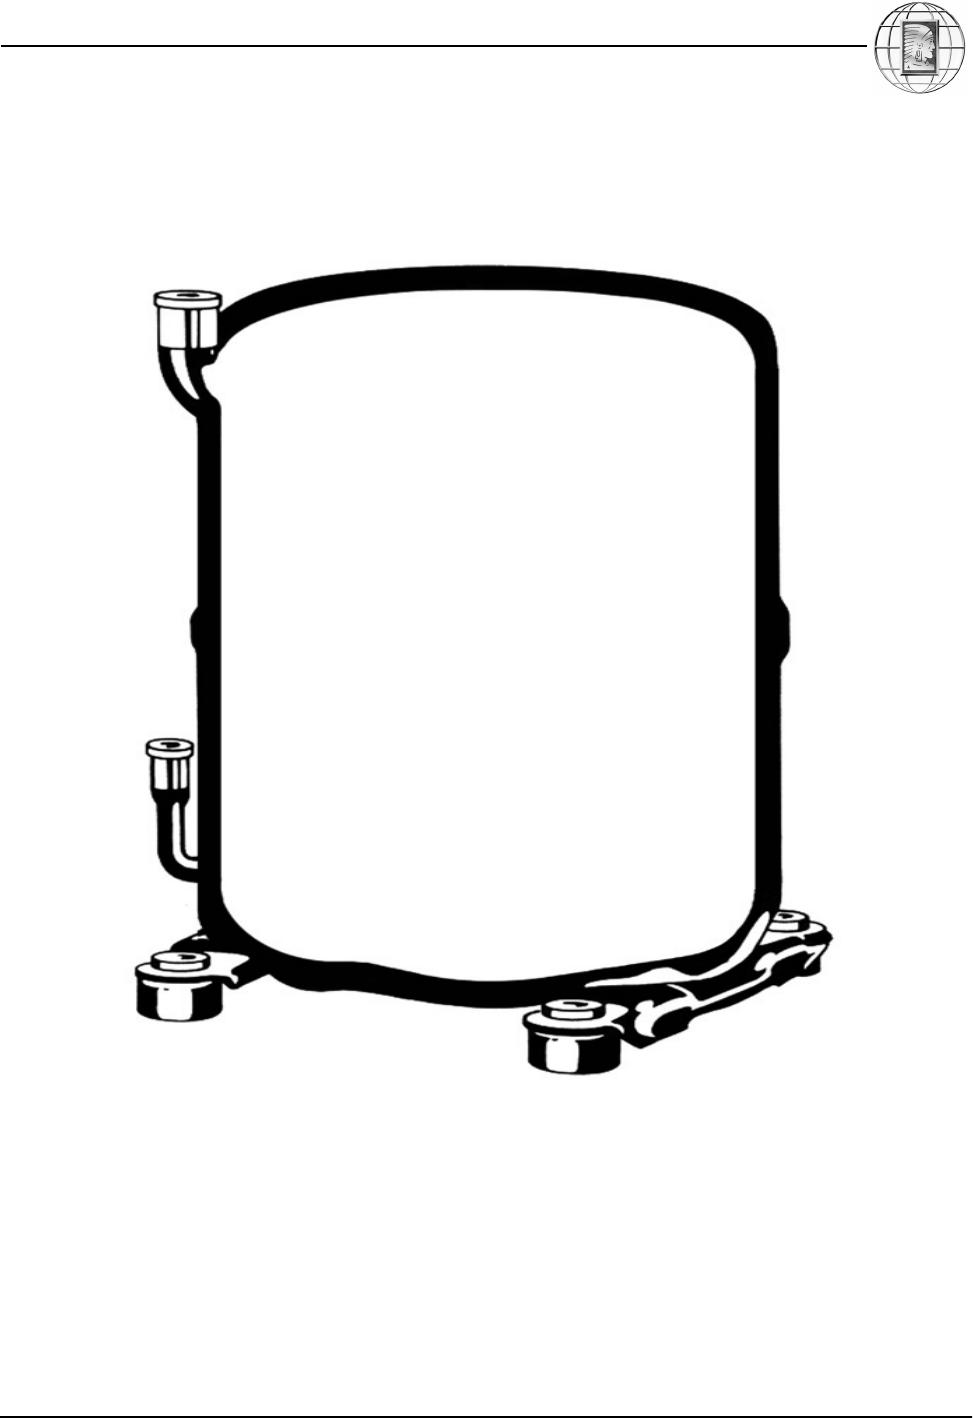 medium resolution of matsushitum compressor wiring diagram